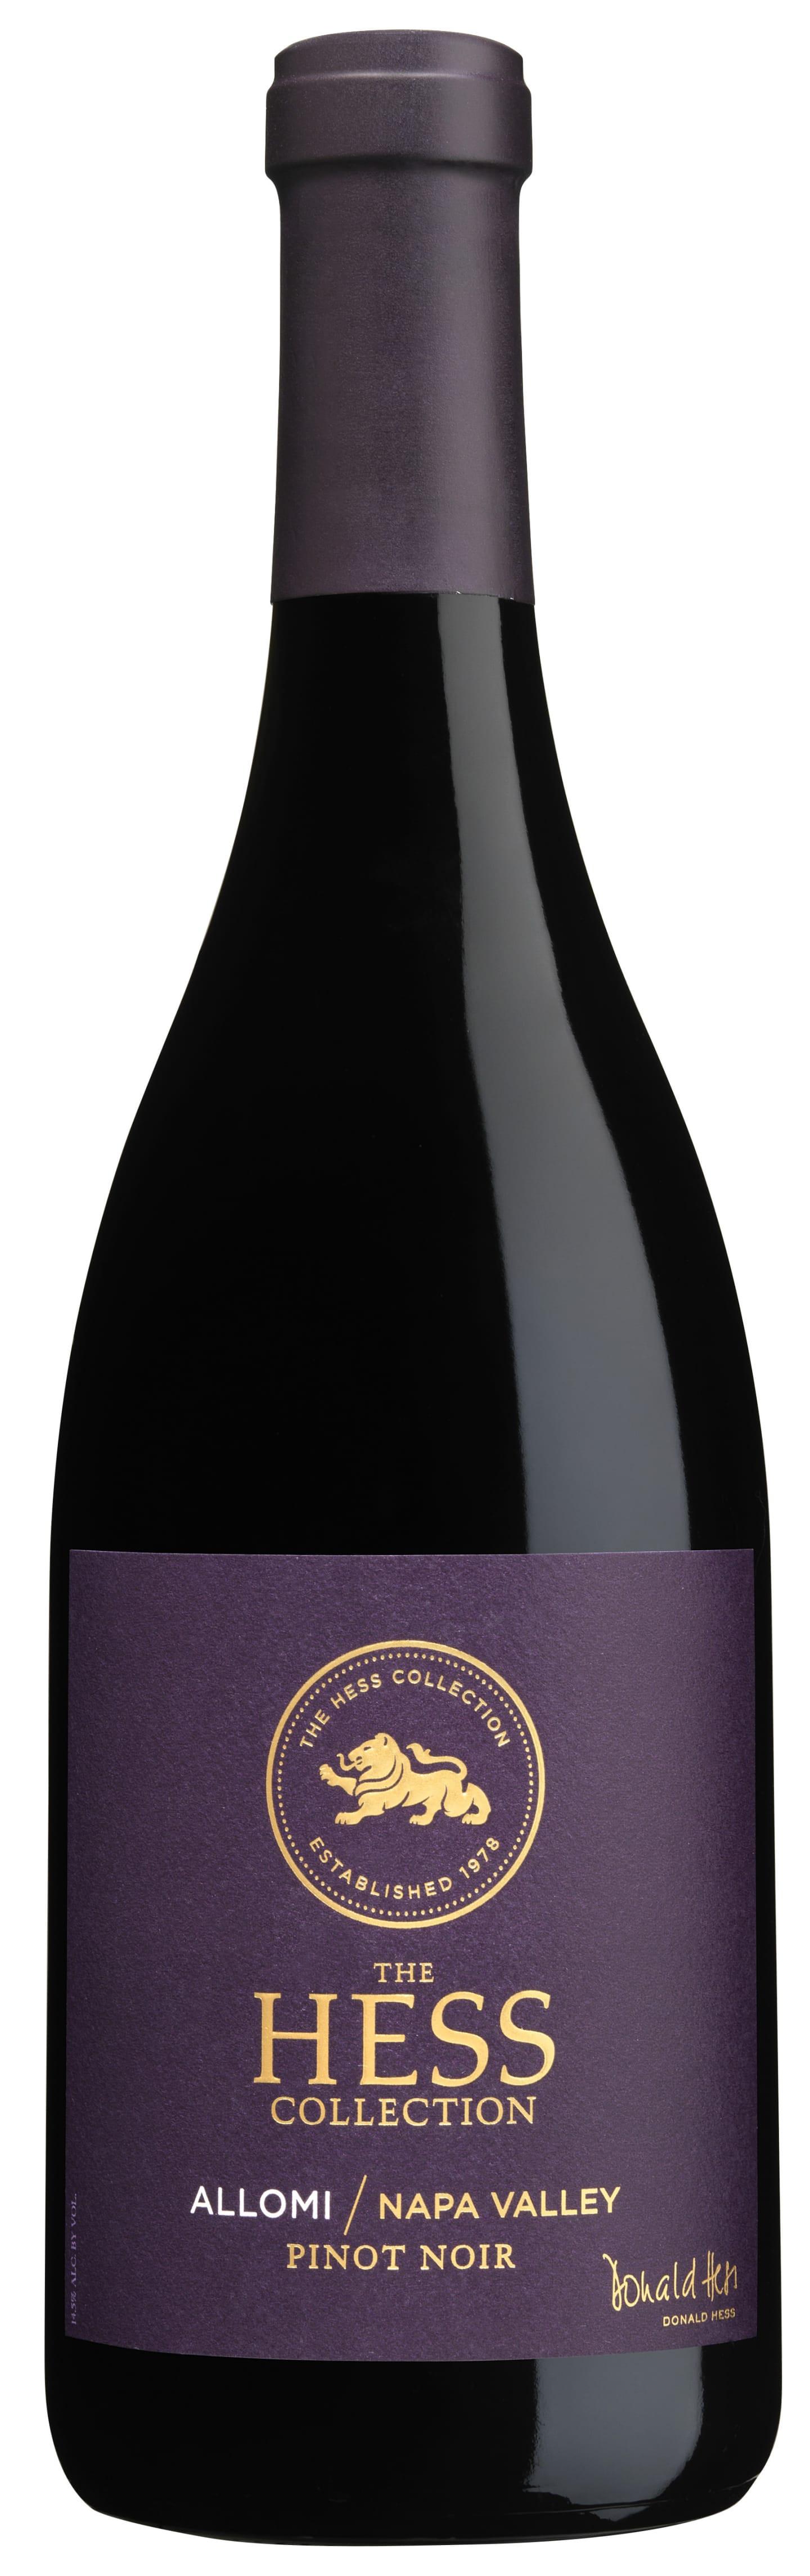 2018 Hess Allomi Napa Valley Pinot Noir 750ml